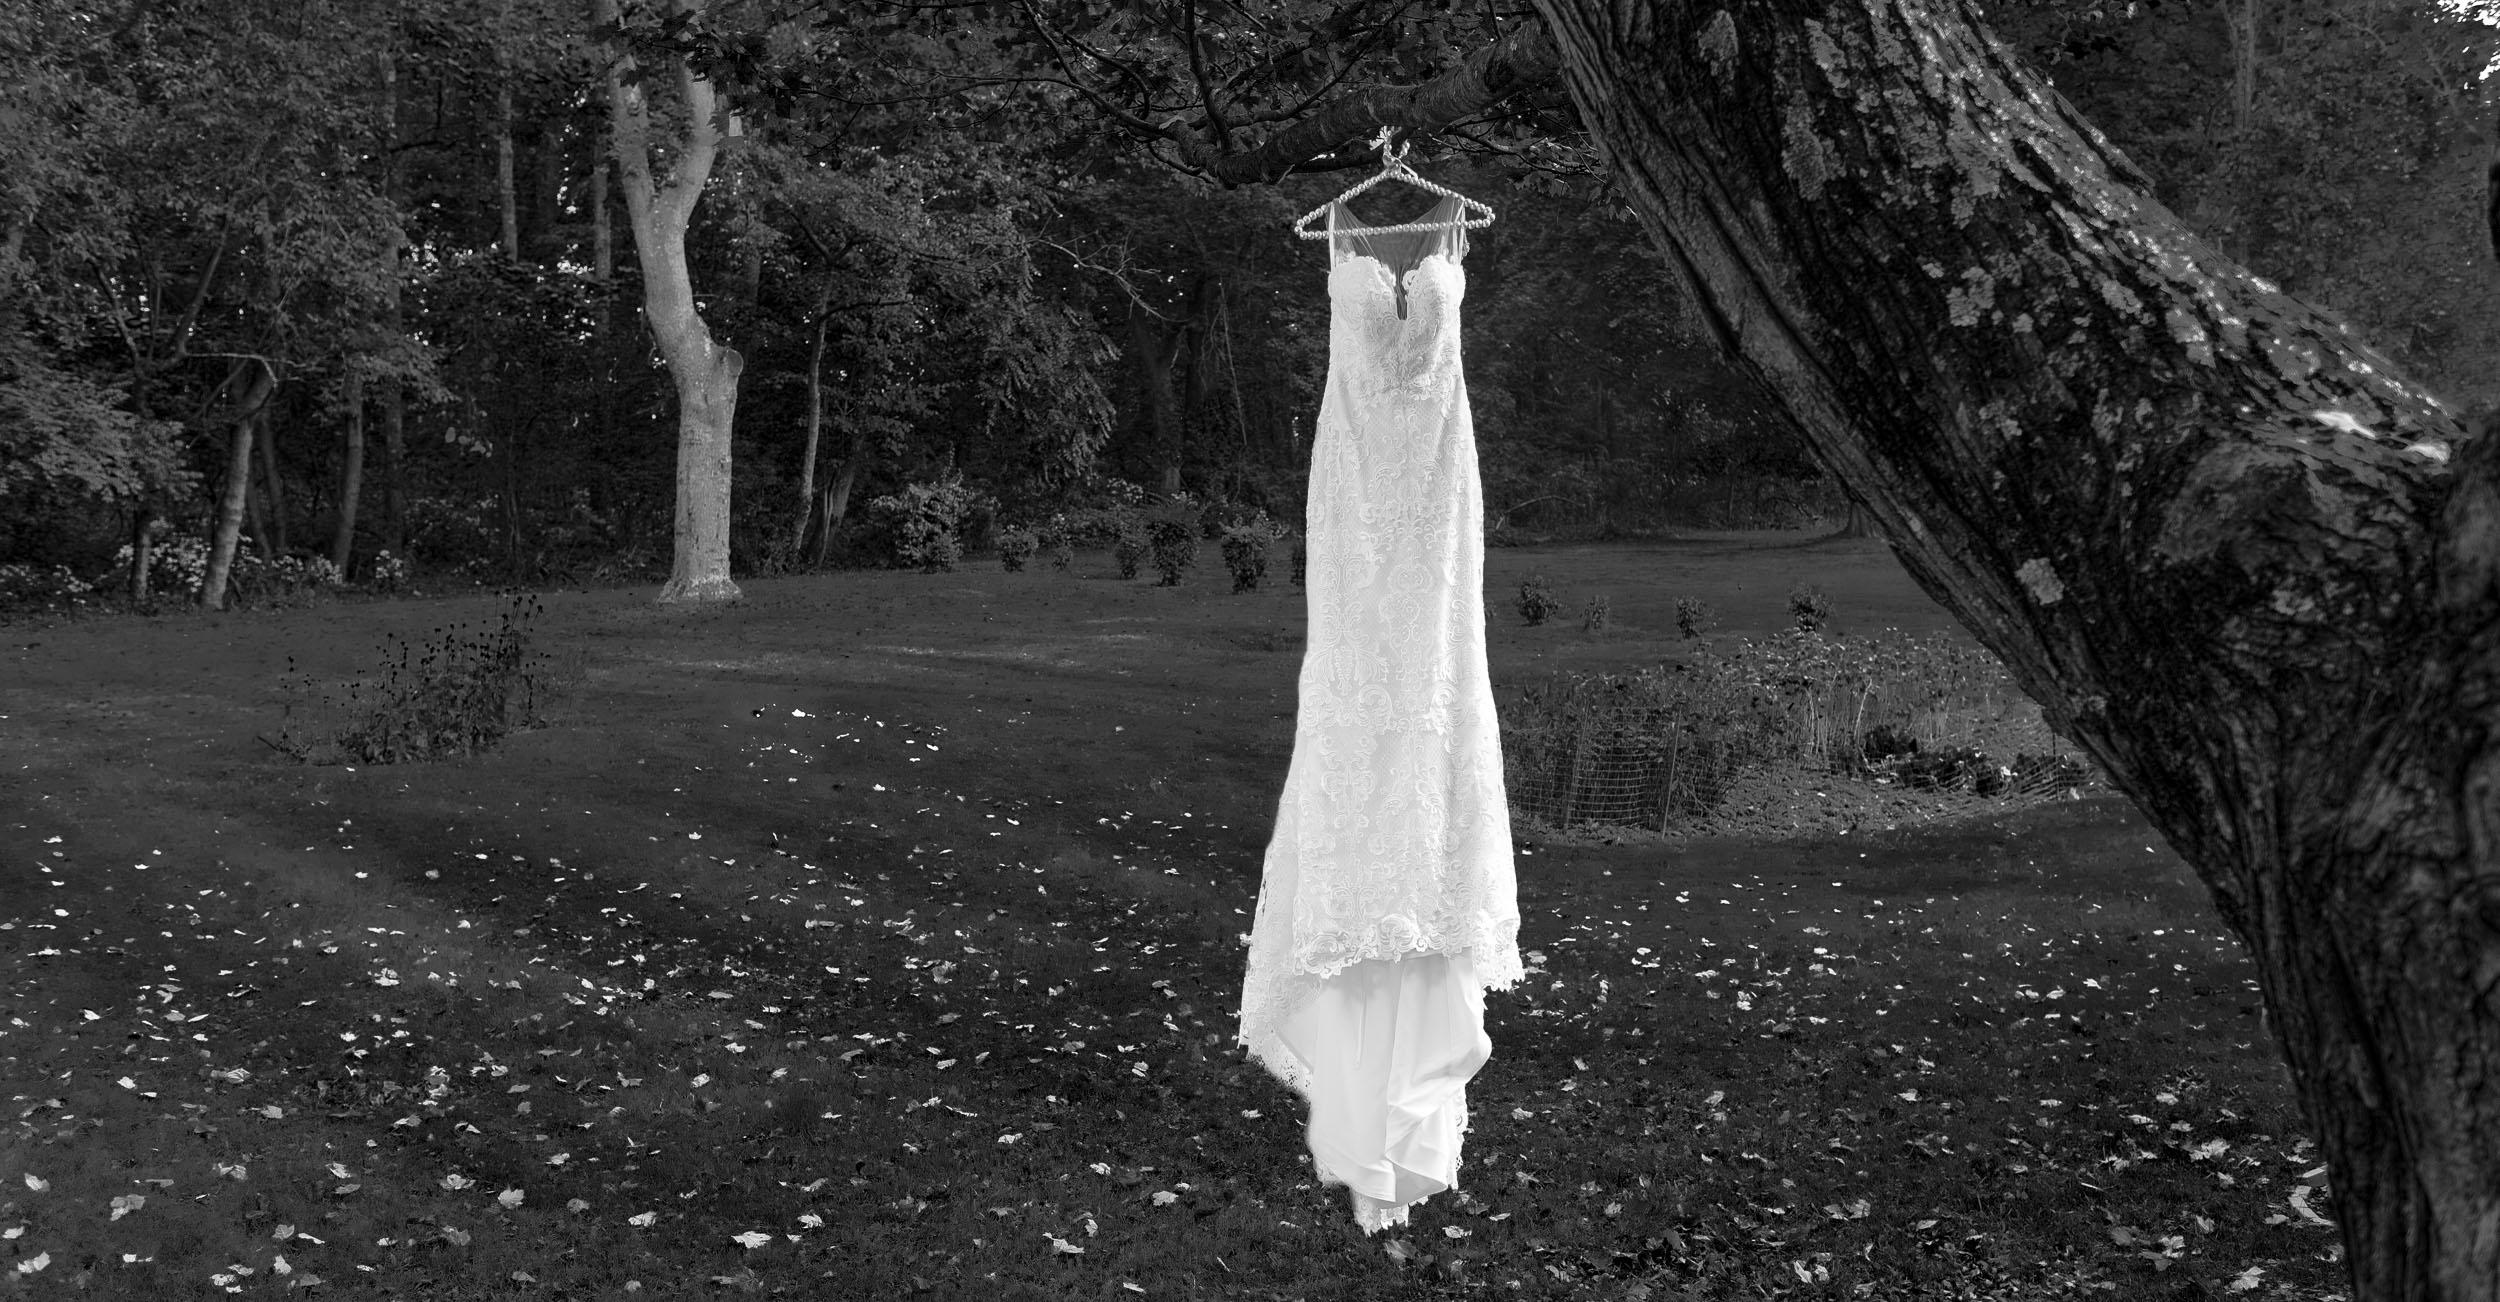 wedding-dress-hanging-from-tree-2.jpg